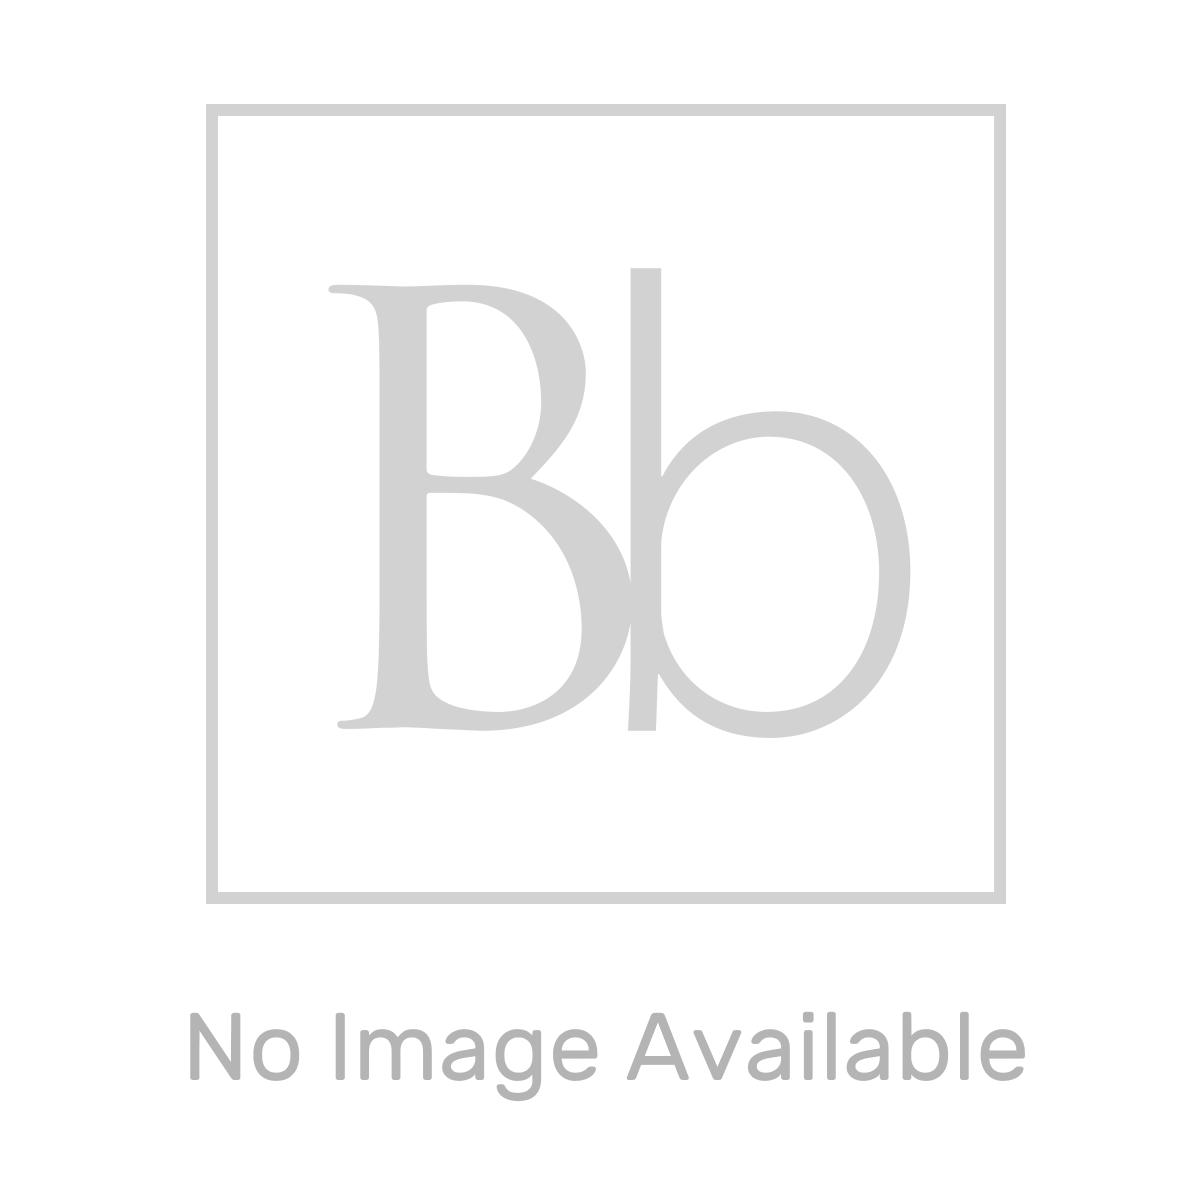 RAK Series 600 En-Suite Bathroom with Pacific Double Sliding Door Shower Enclosure Recess